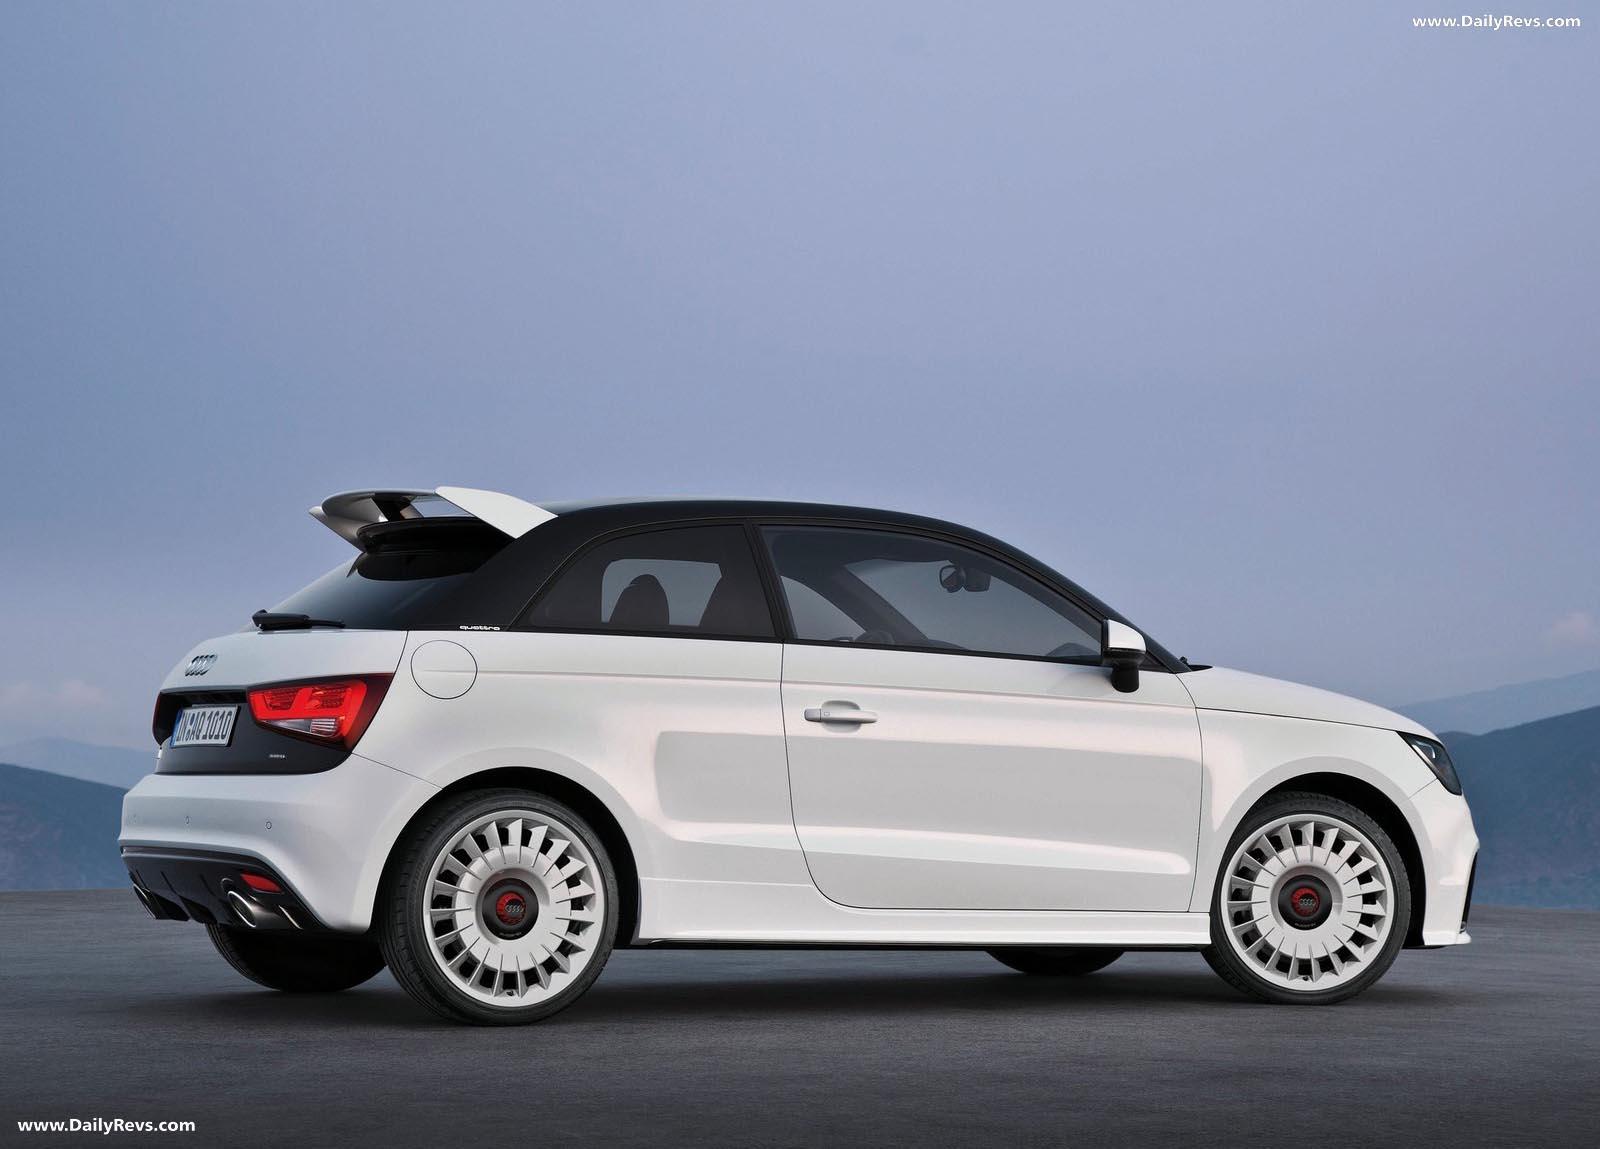 2013 Audi A1 quattro - HD Pictures, Videos, Specs ...